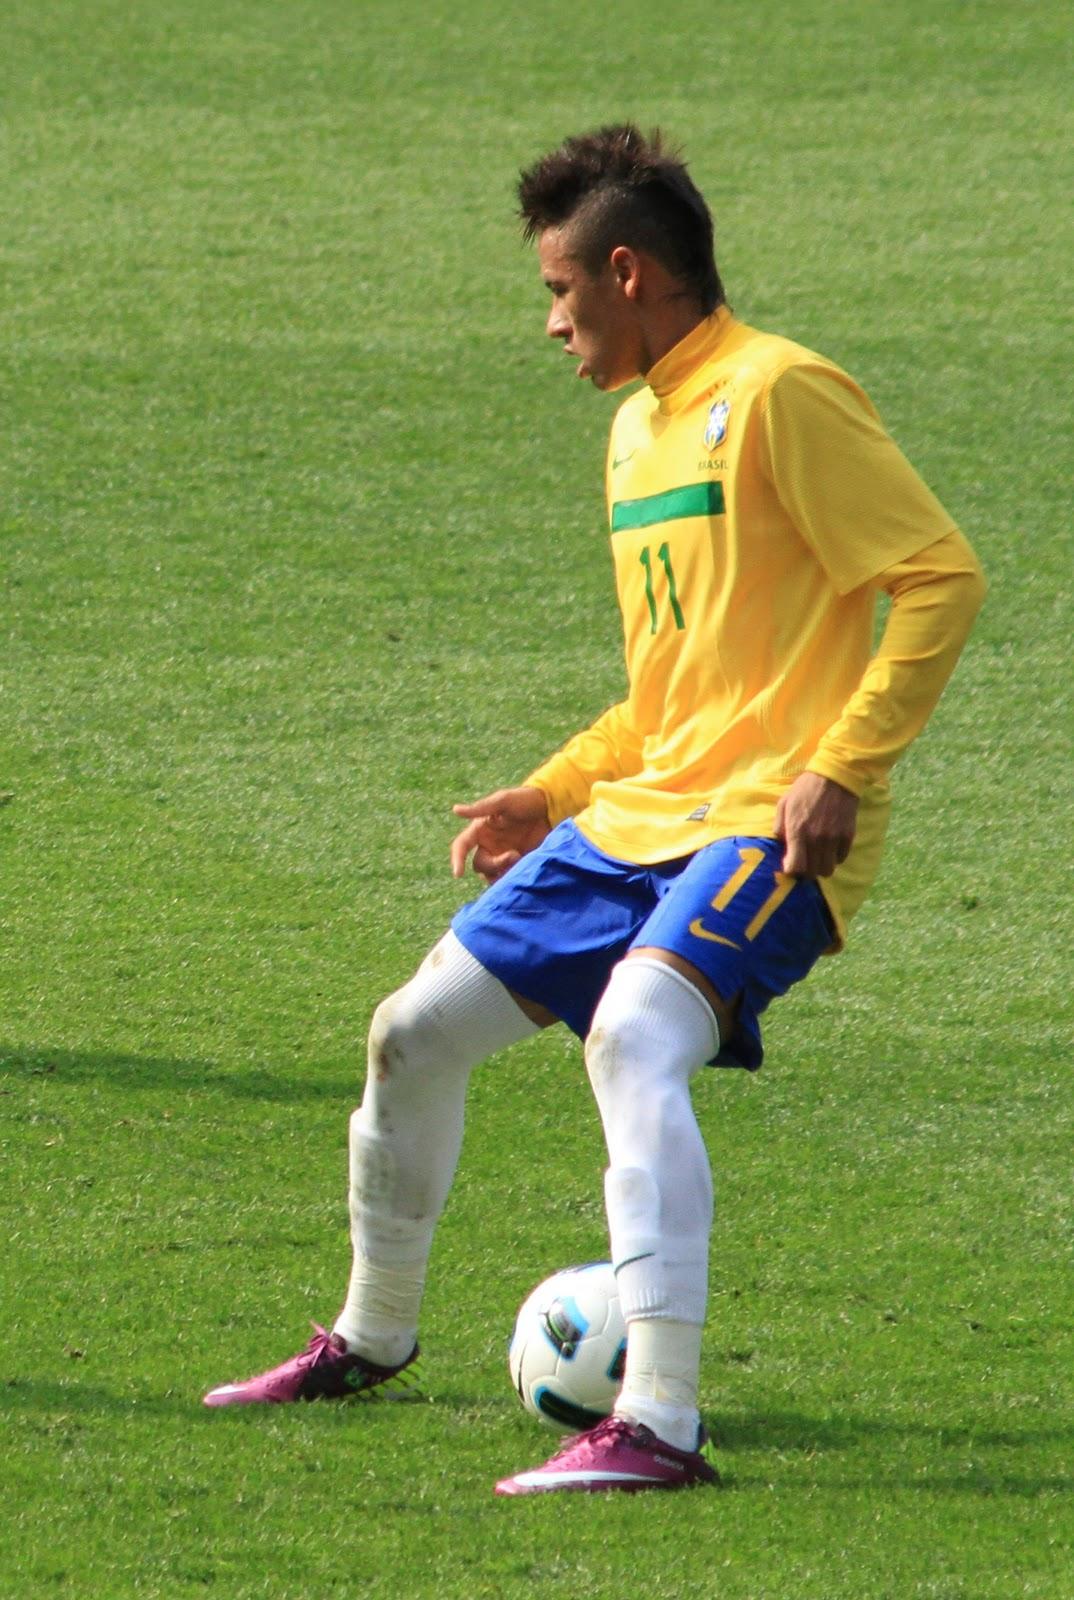 Super Stars Neymar Young Football Star